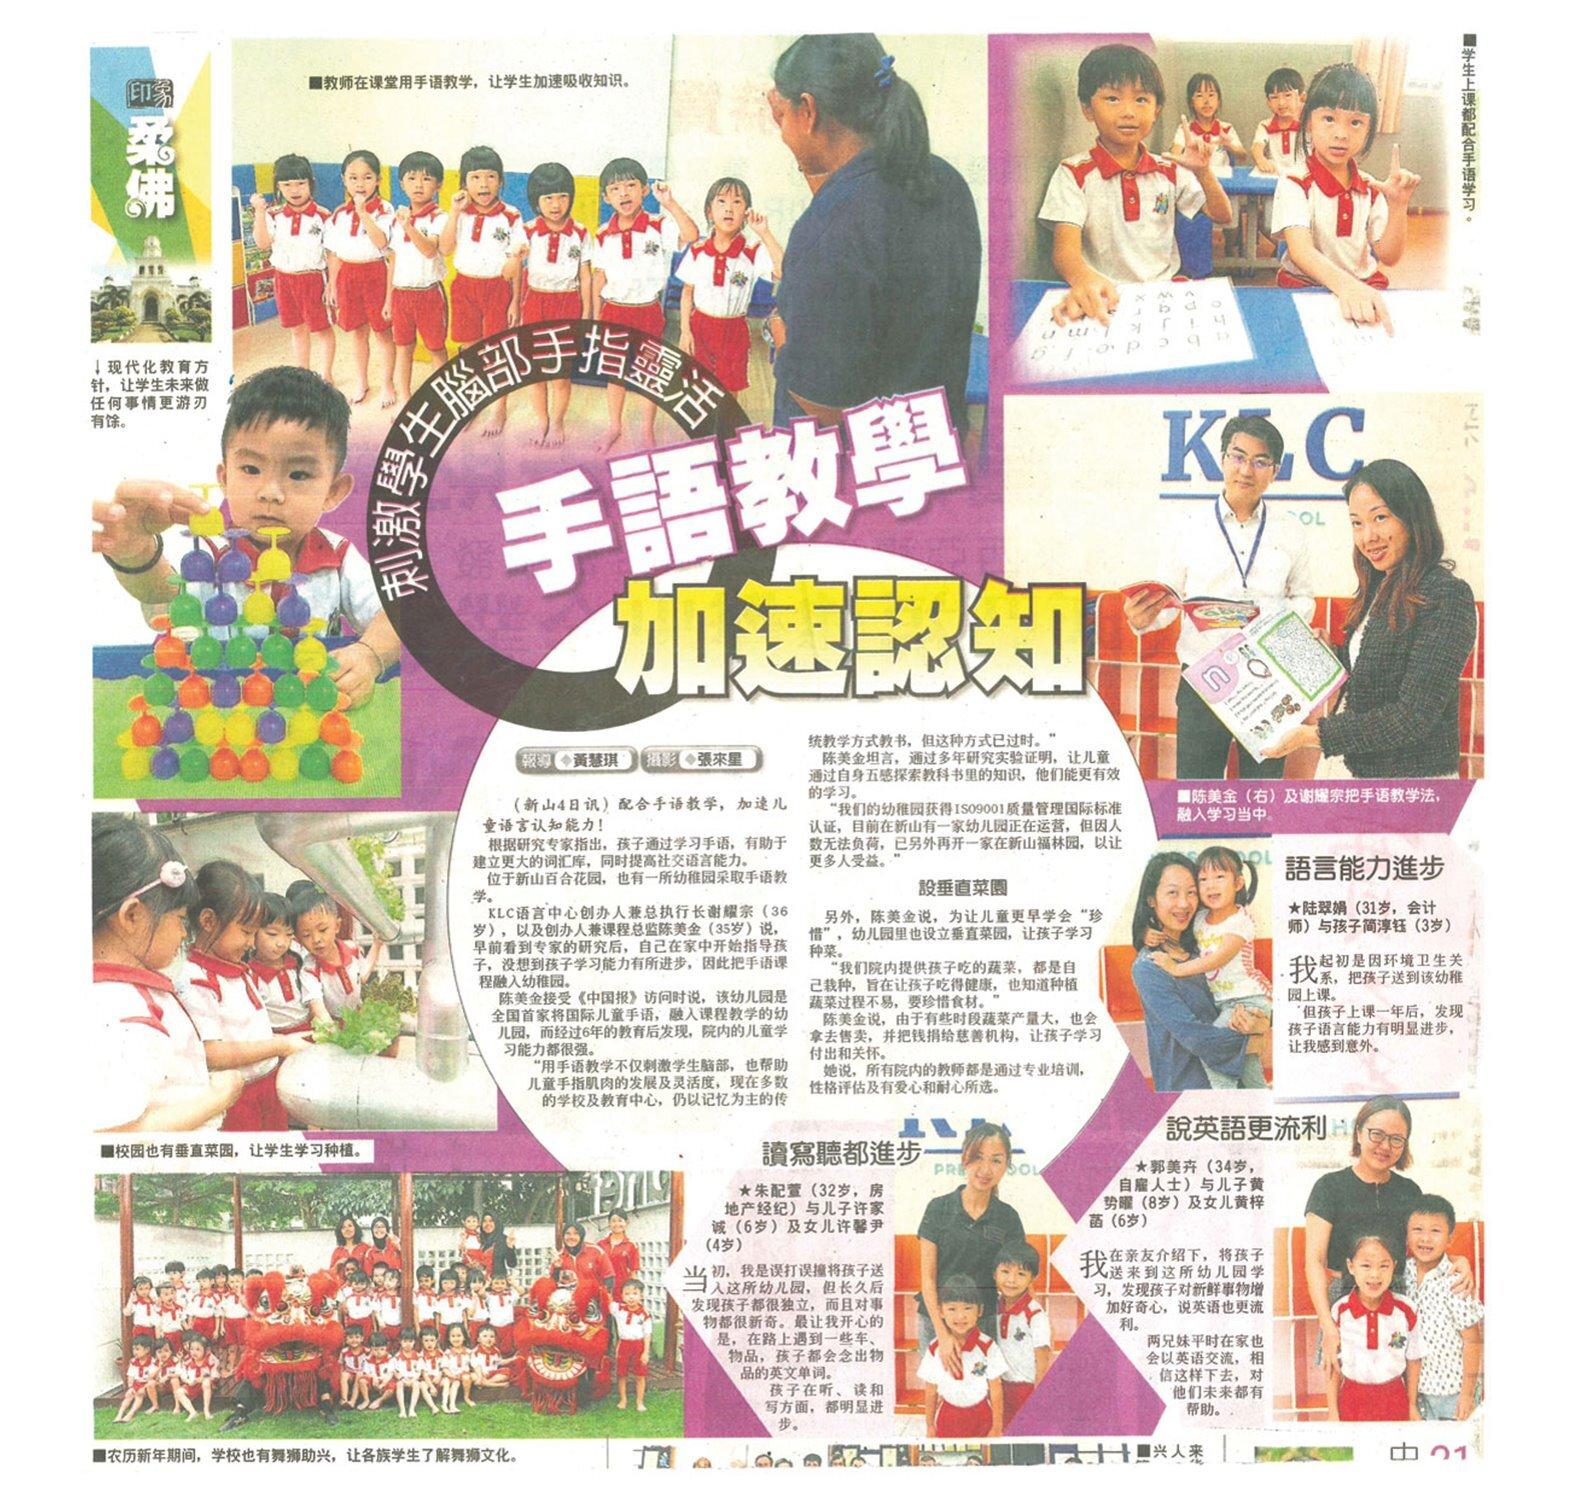 KLC幼儿园是全马第一间引入手语认知教学的幼儿园,刺激学生脑部手指灵活。